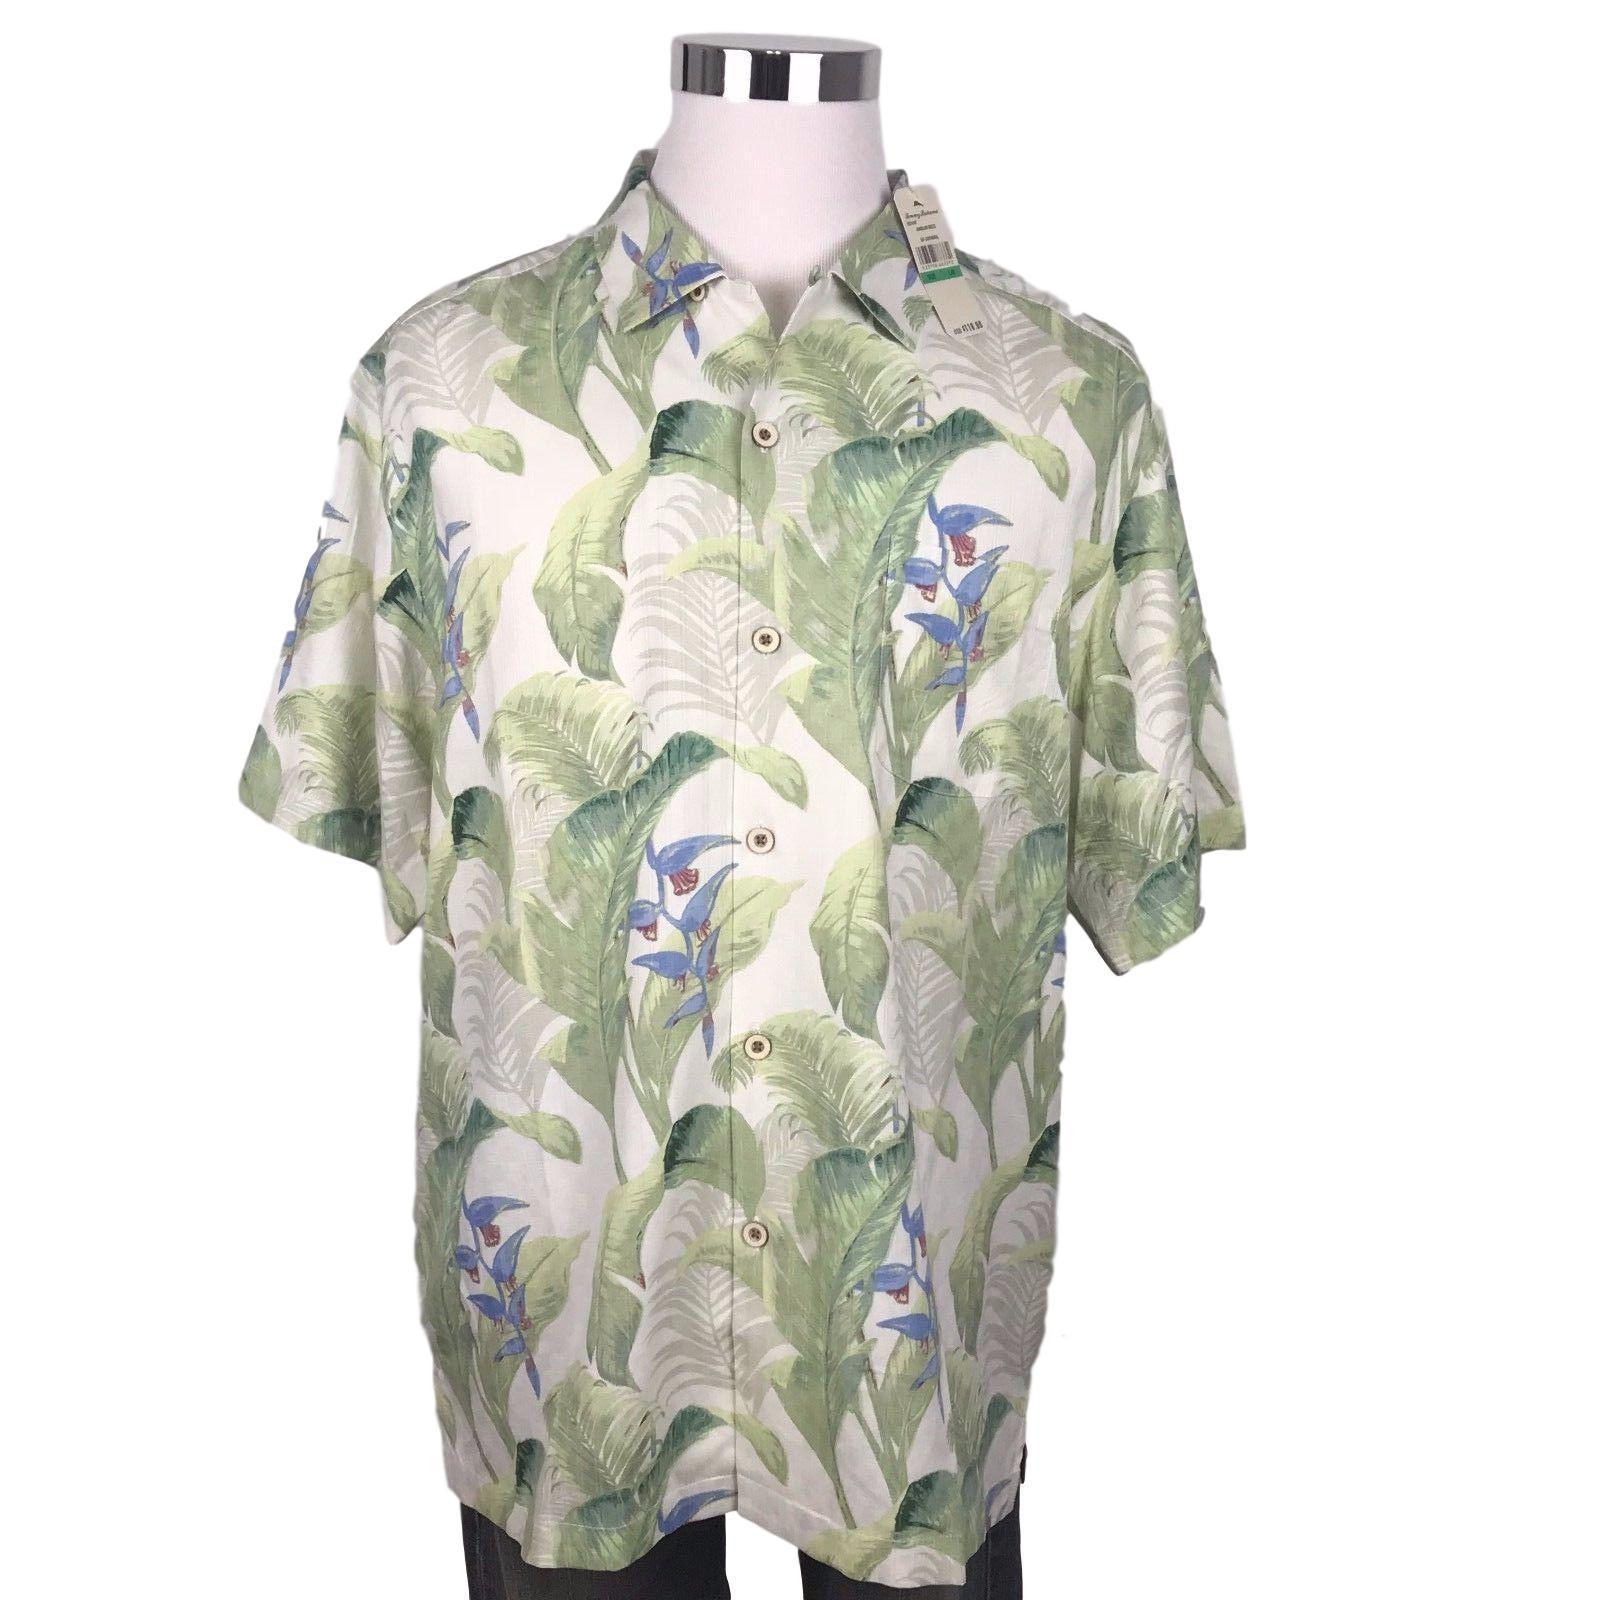 03f26919 Tommy Bahama Silk Hawaiian Camp Shirt Size Large Mens Bungalow ...